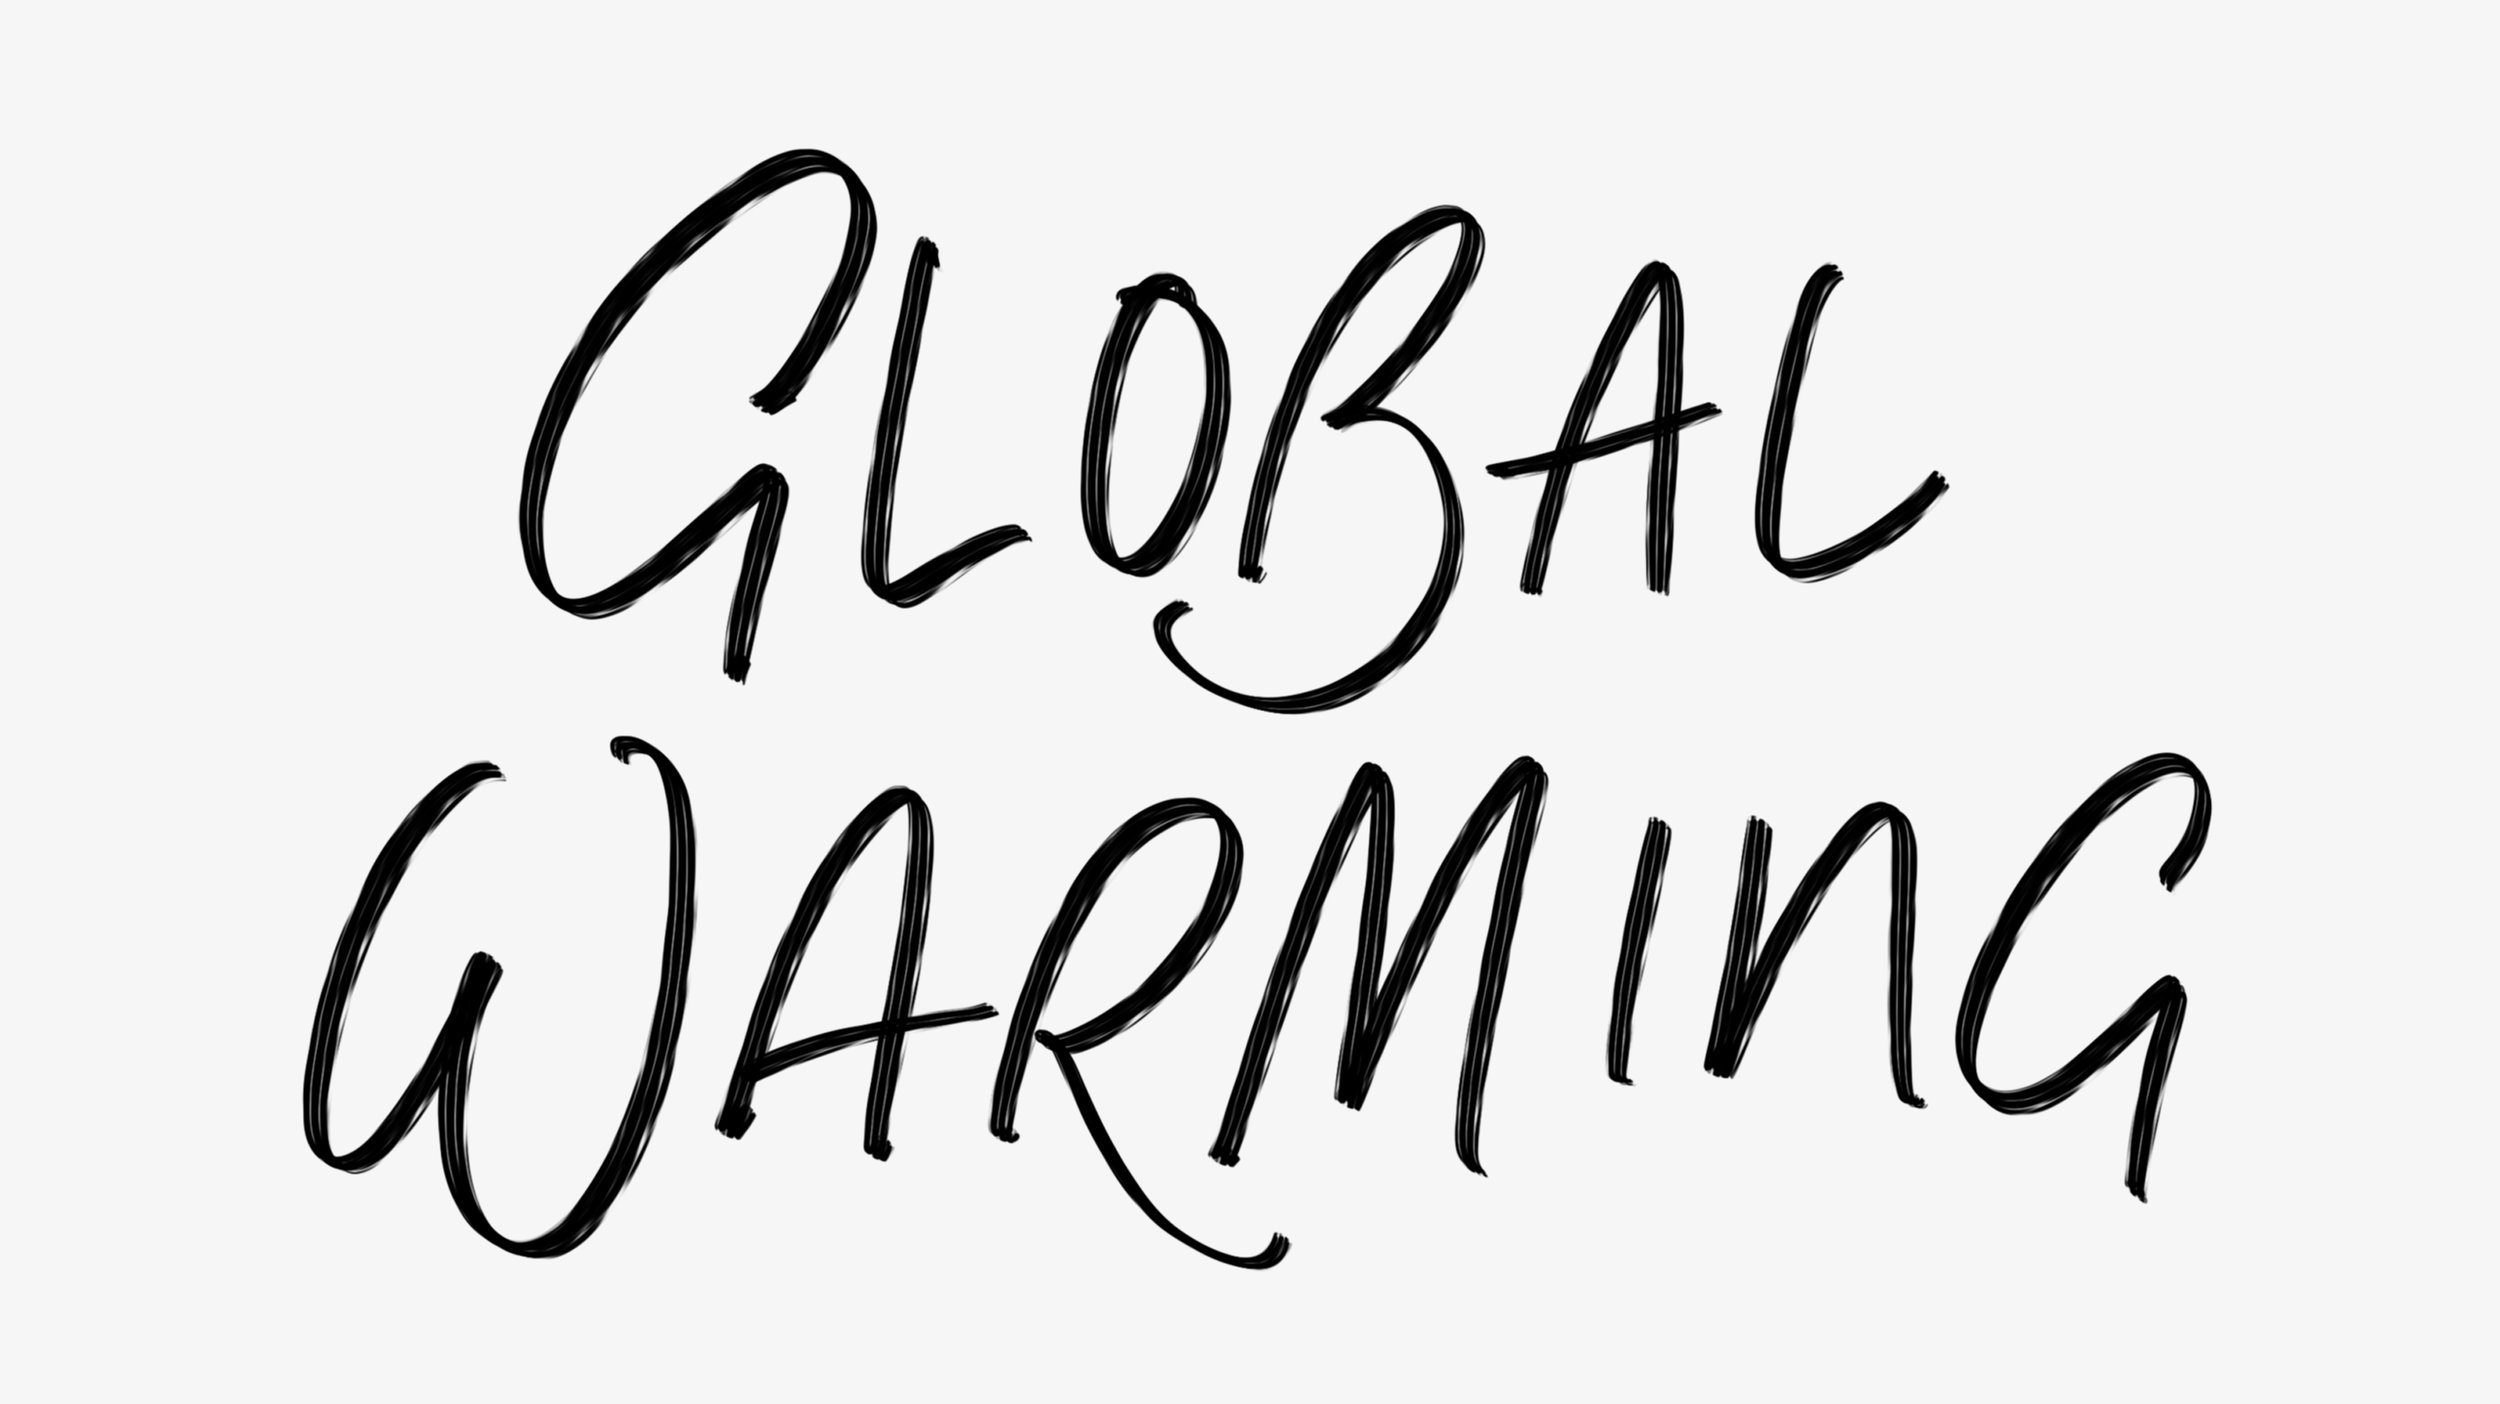 SC_Global Warming.jpg